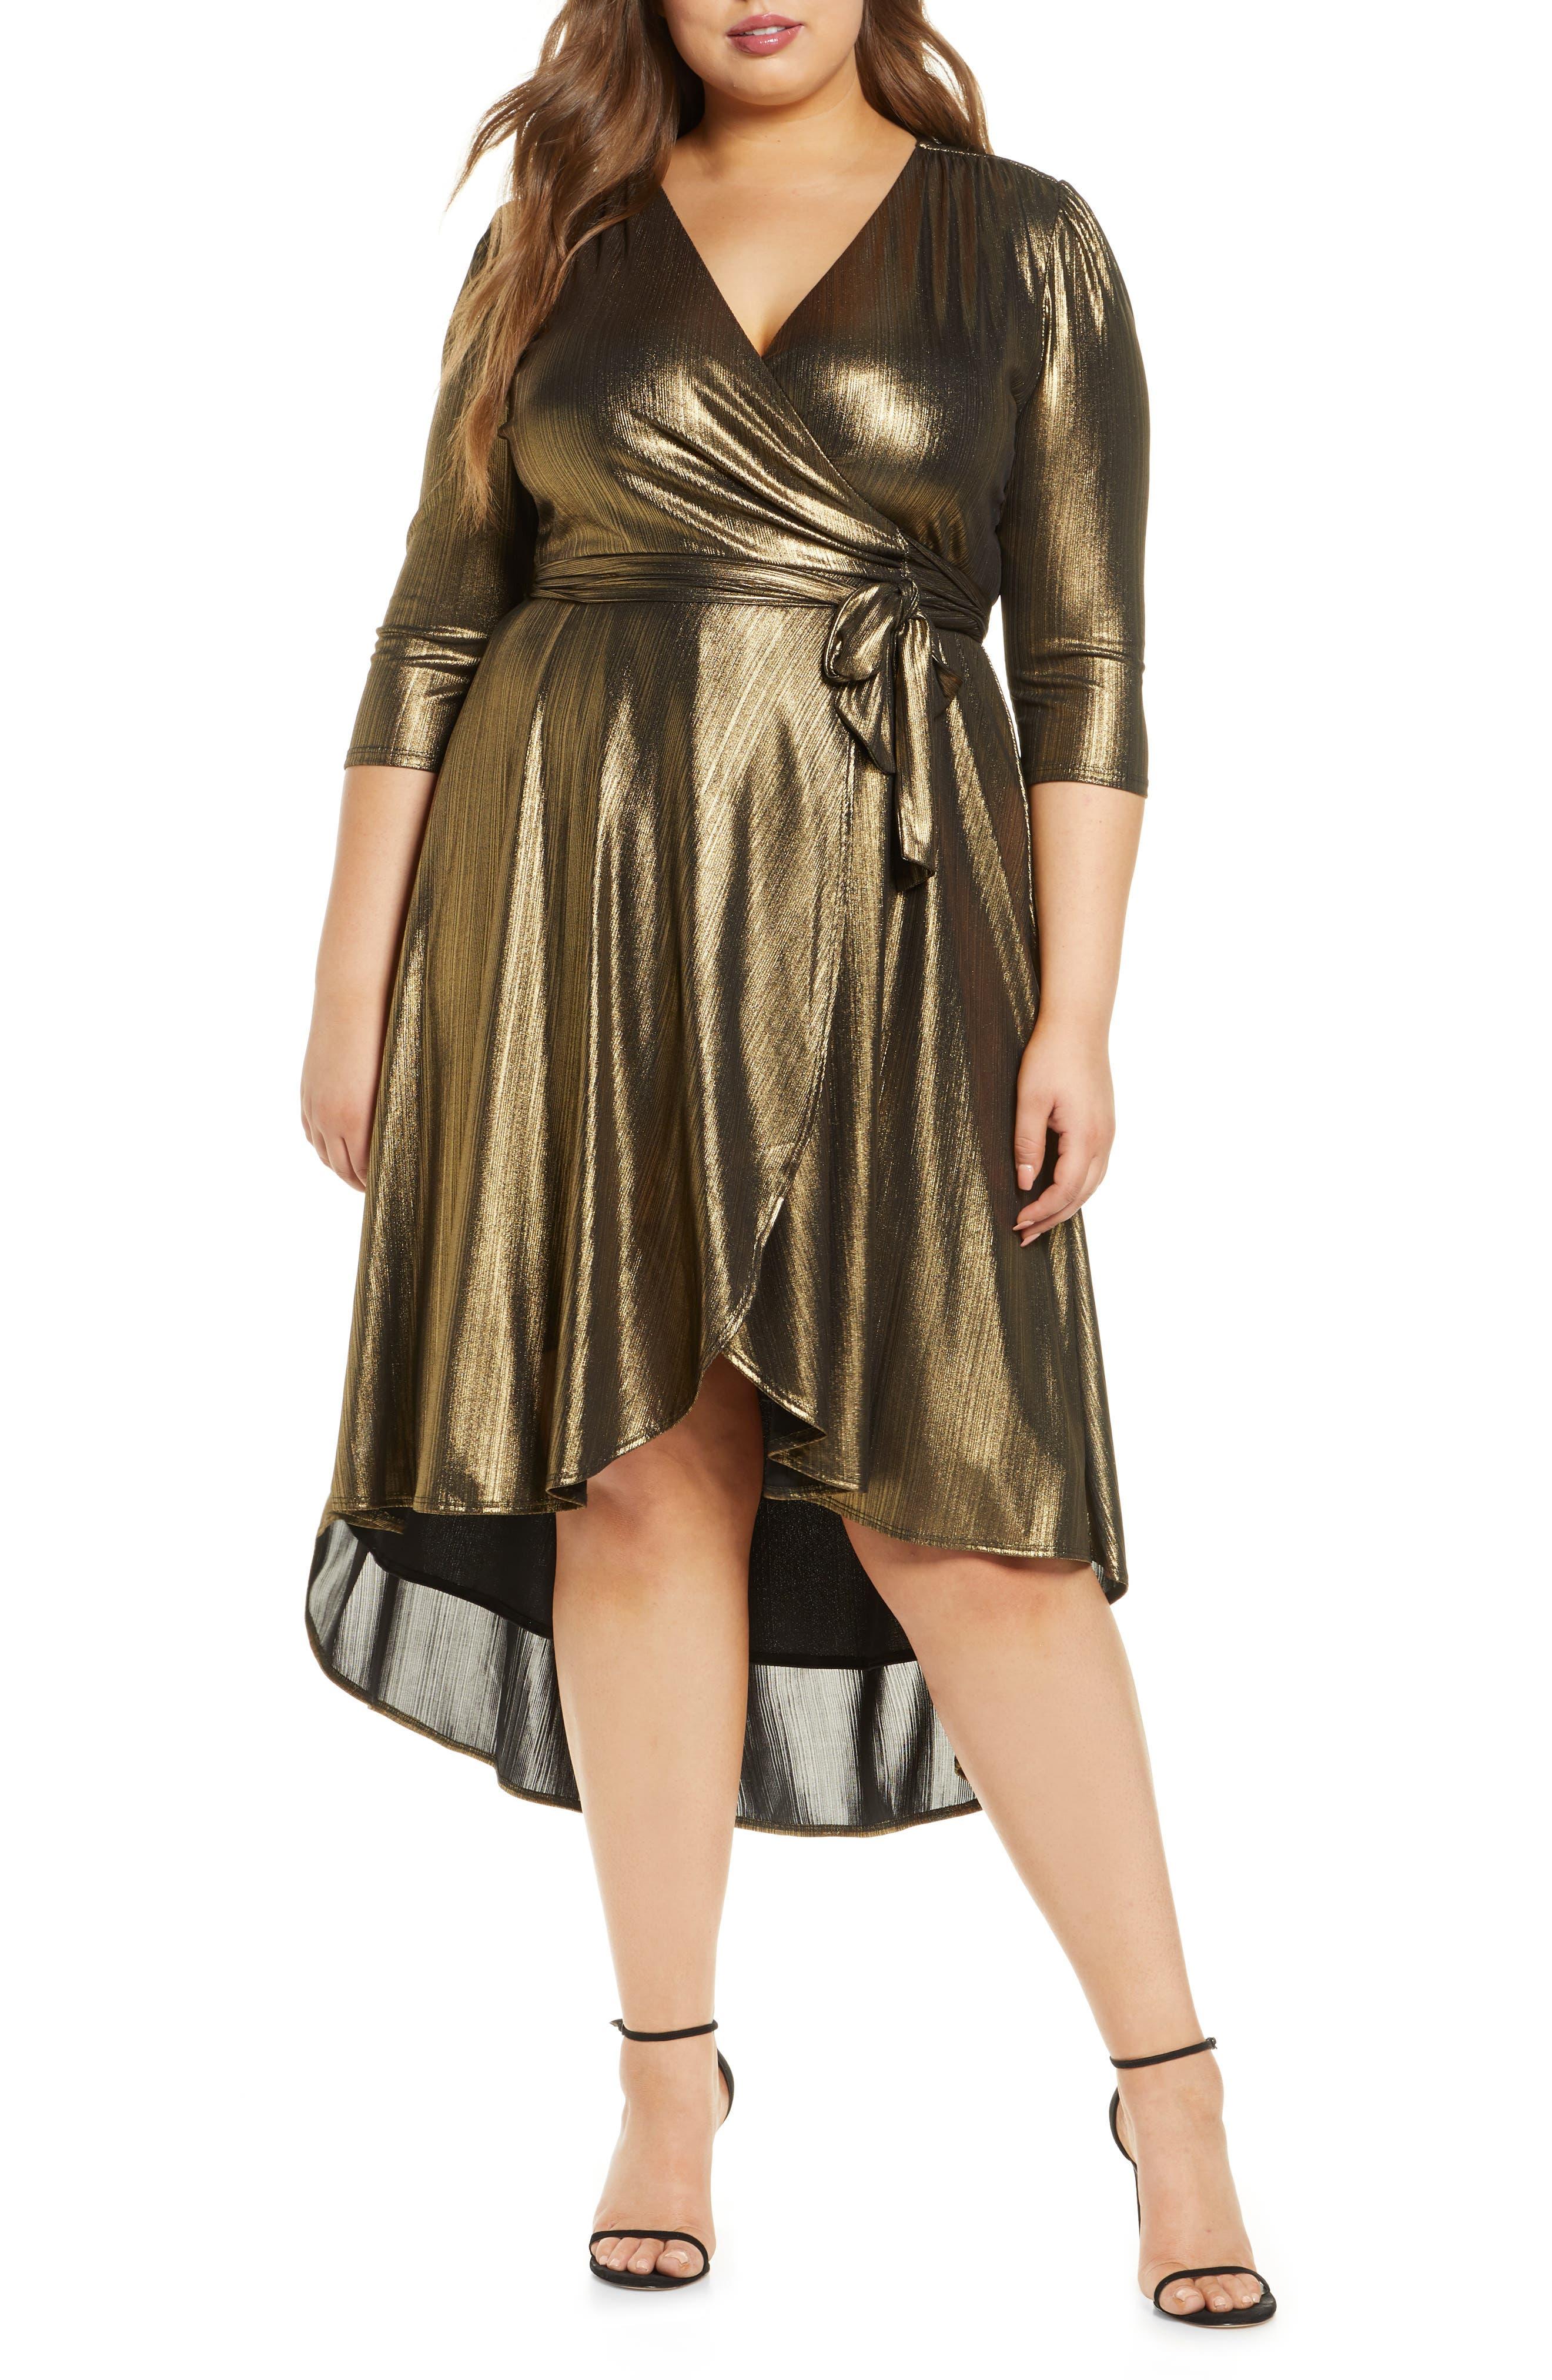 70s Dresses – Disco Dress, Hippie Dress, Wrap Dress Plus Size Womens Kiyonna Monroe Metallic Highlow Wrap Dress $148.00 AT vintagedancer.com